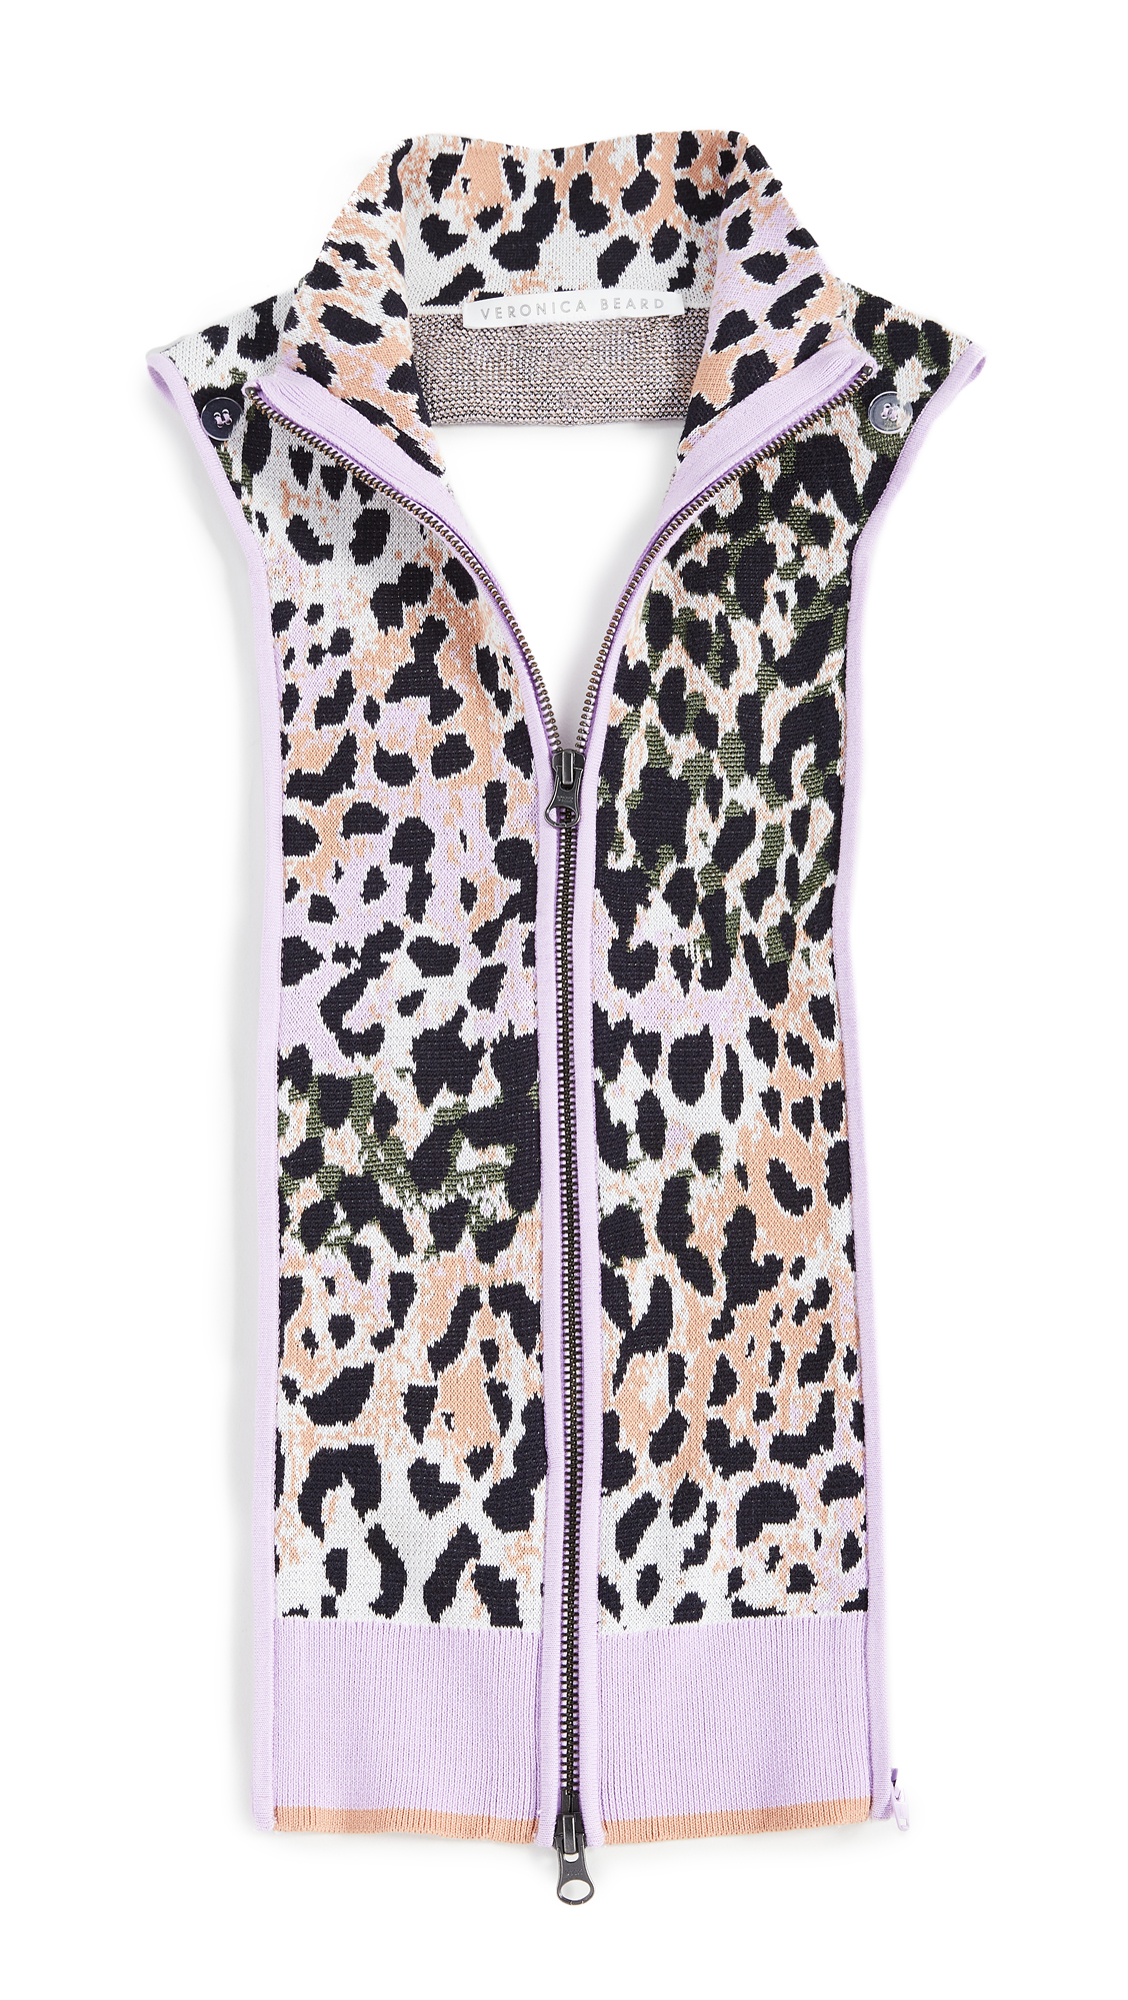 Buy Veronica Beard Jai Dickey online beautiful Veronica Beard Jackets, Coats, Coats